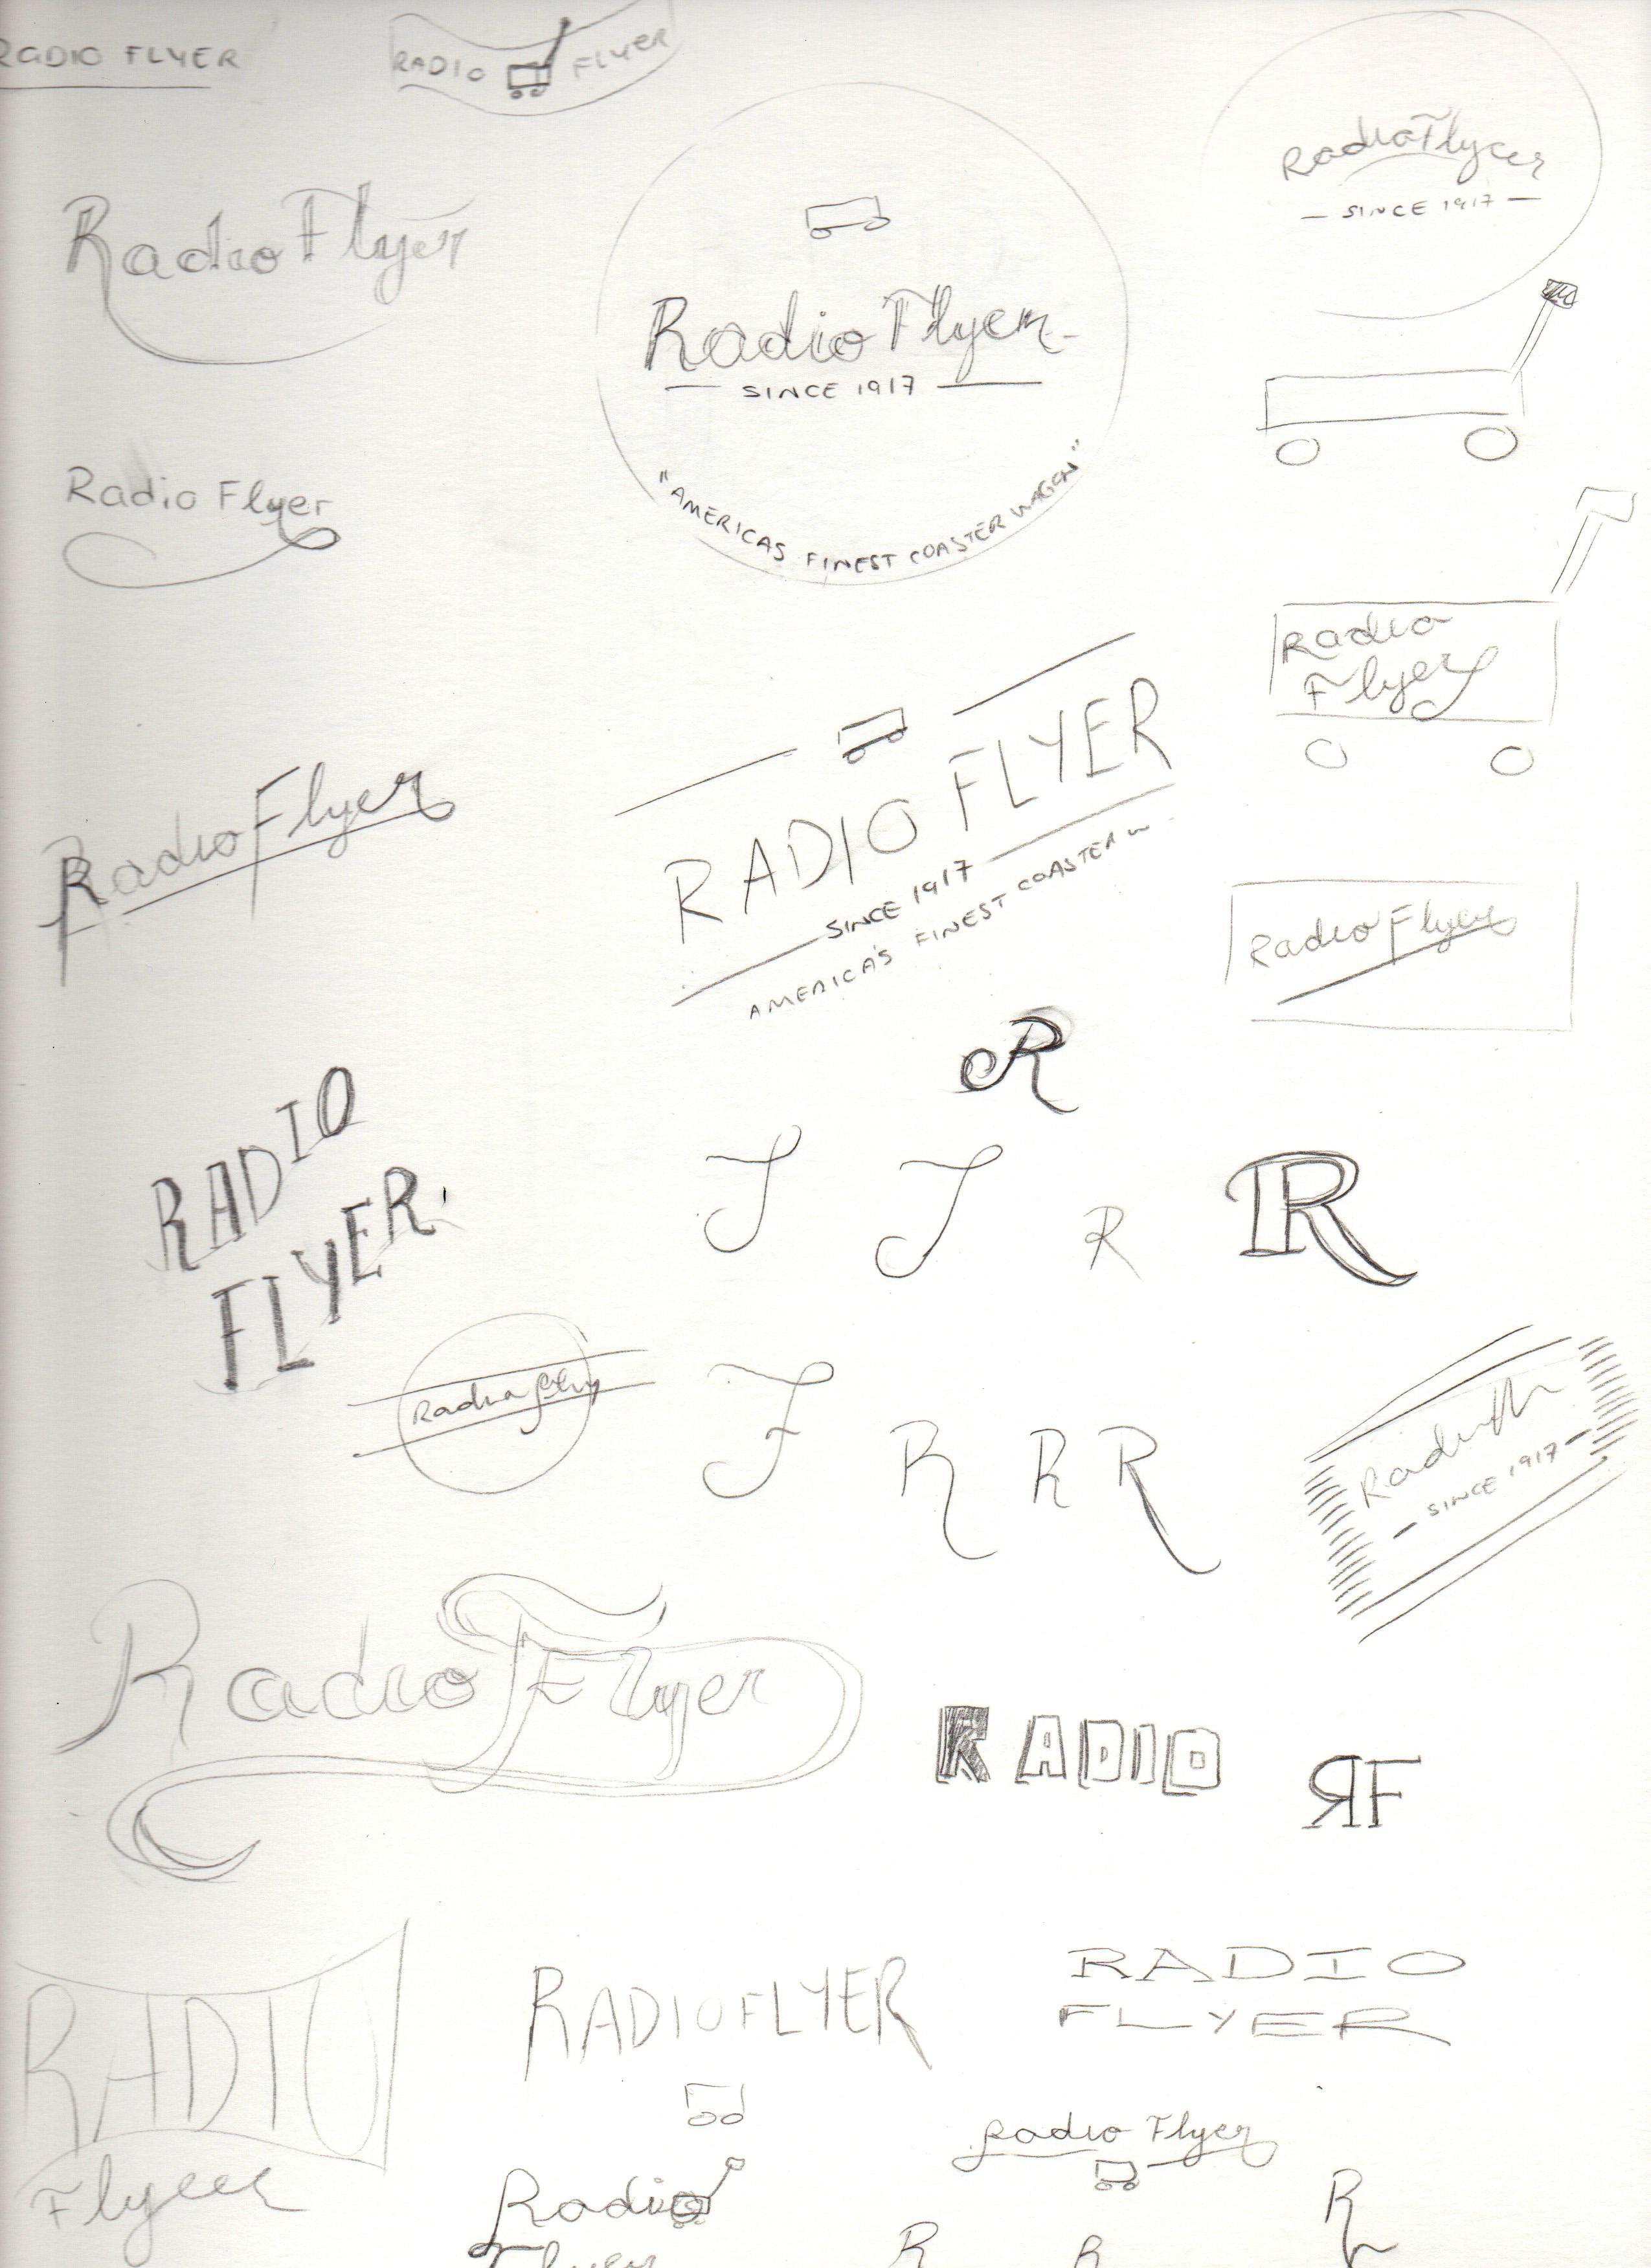 Radio Flyer - image 2 - student project